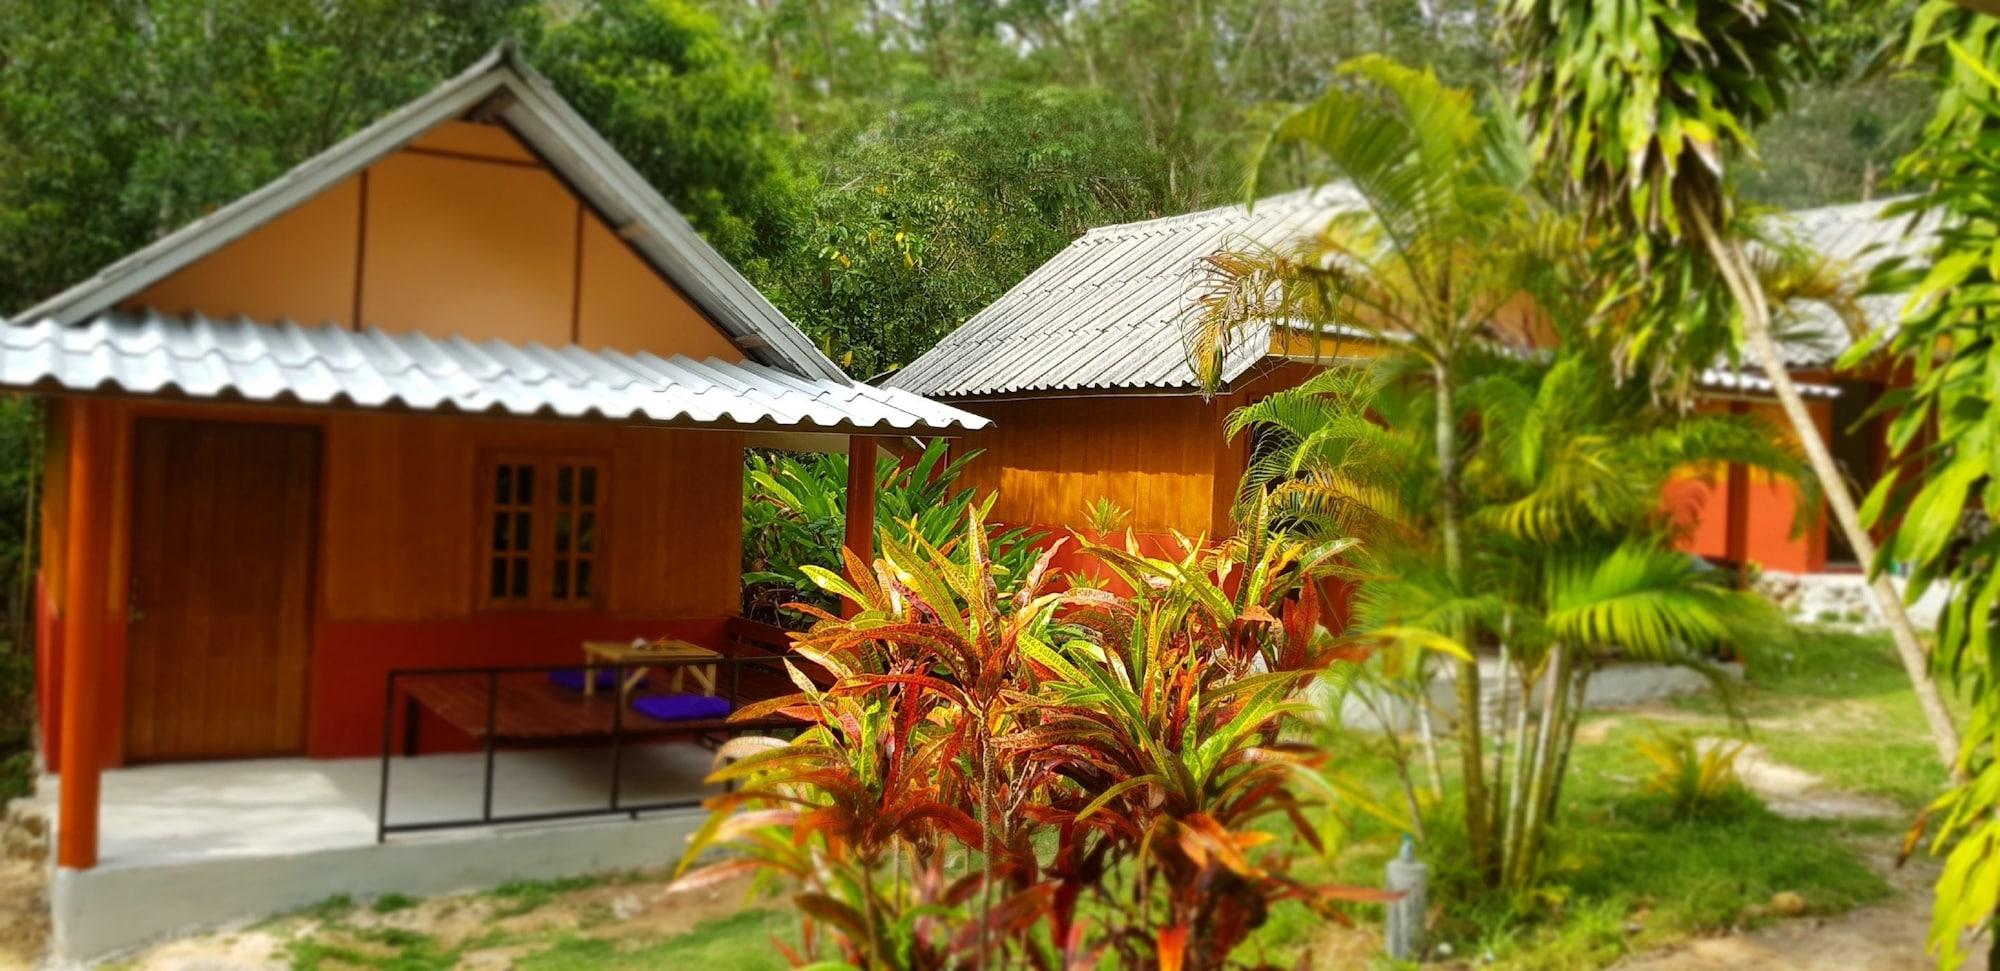 Coral Bay Resort, Nua Khlong